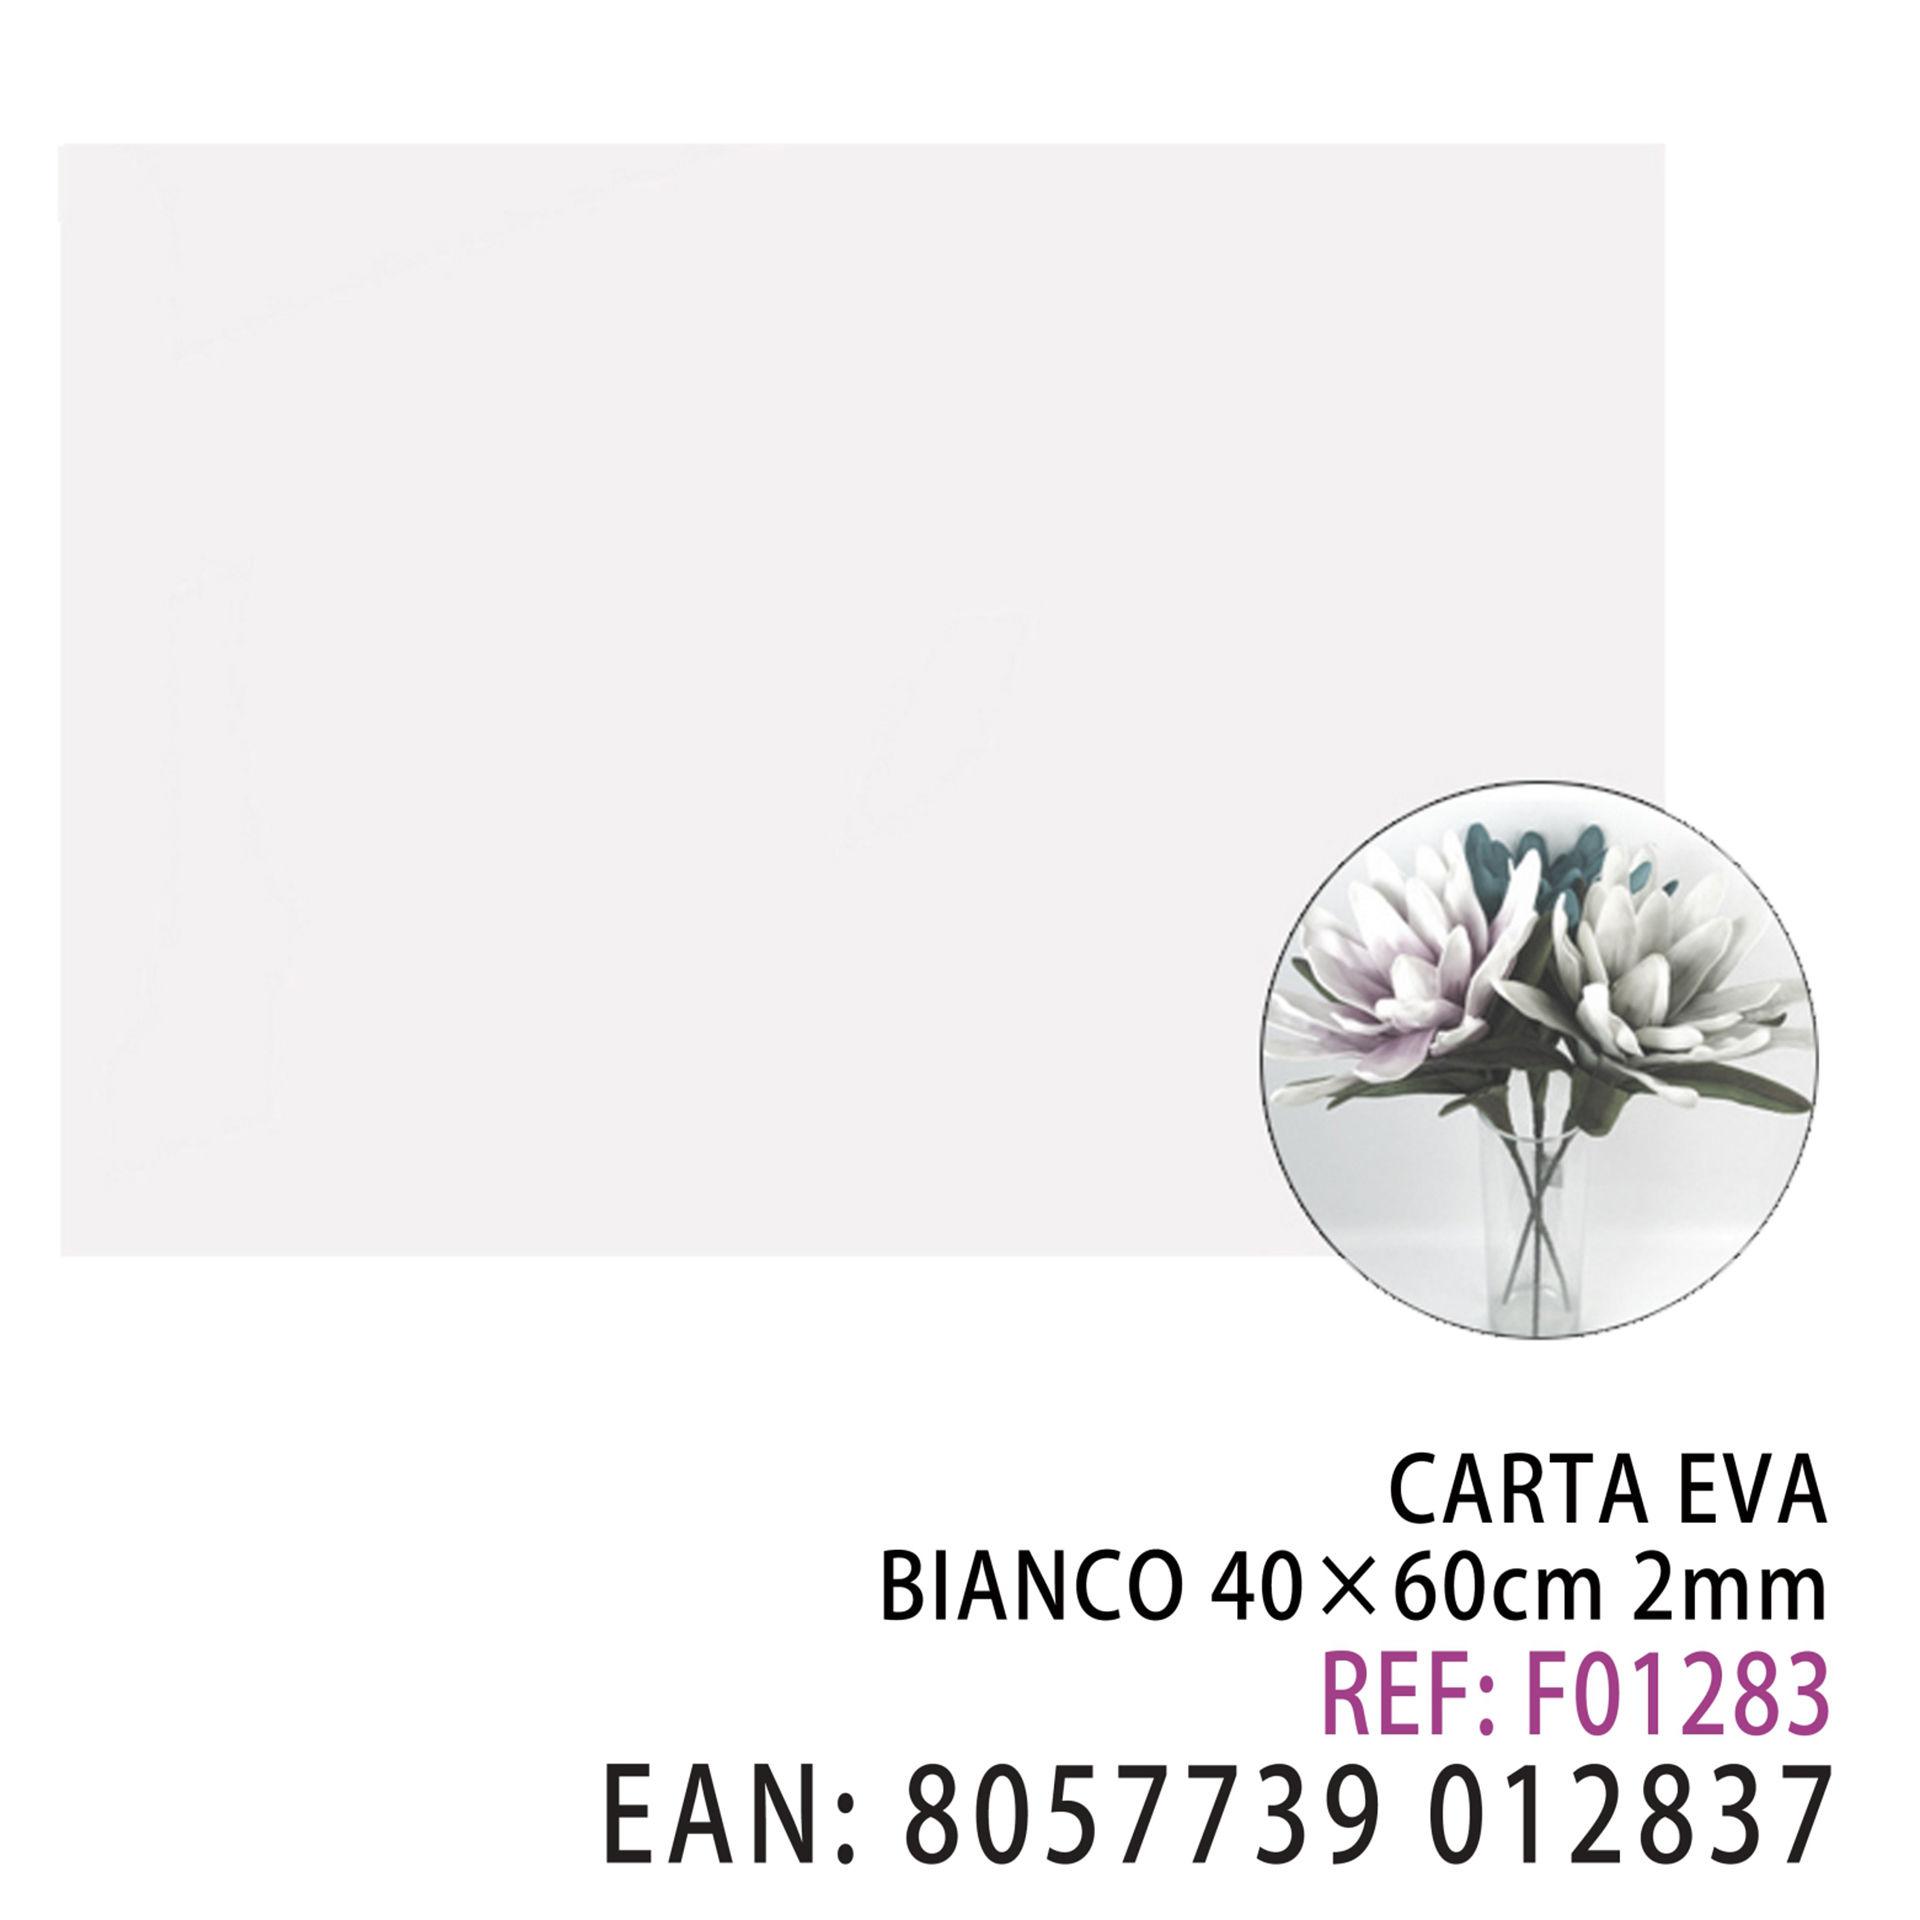 EVA BIANCO 40*60CM*2MMDz